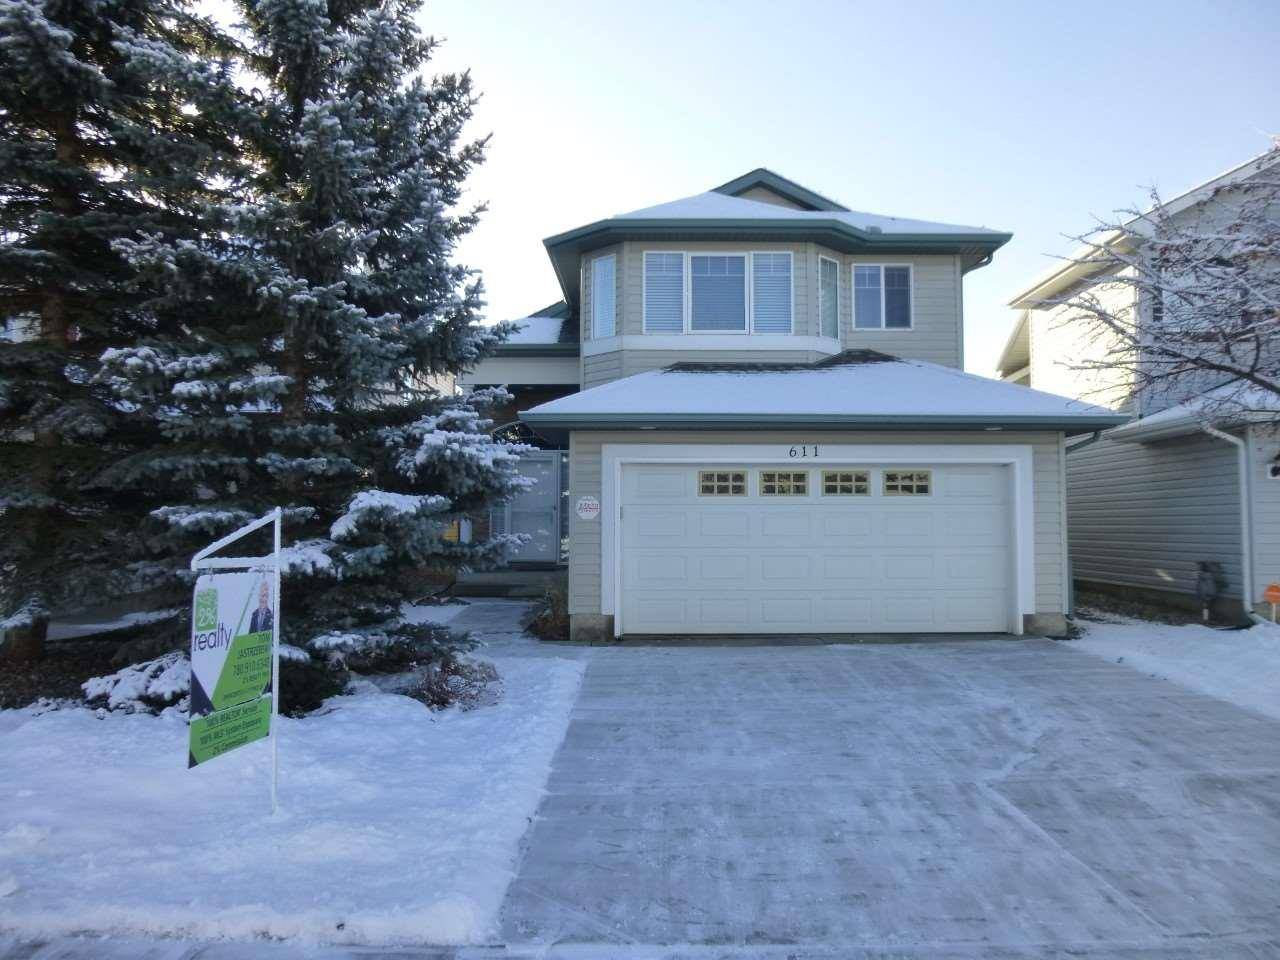 House for sale at 611 Beck Cs Sw Edmonton Alberta - MLS: E4175149